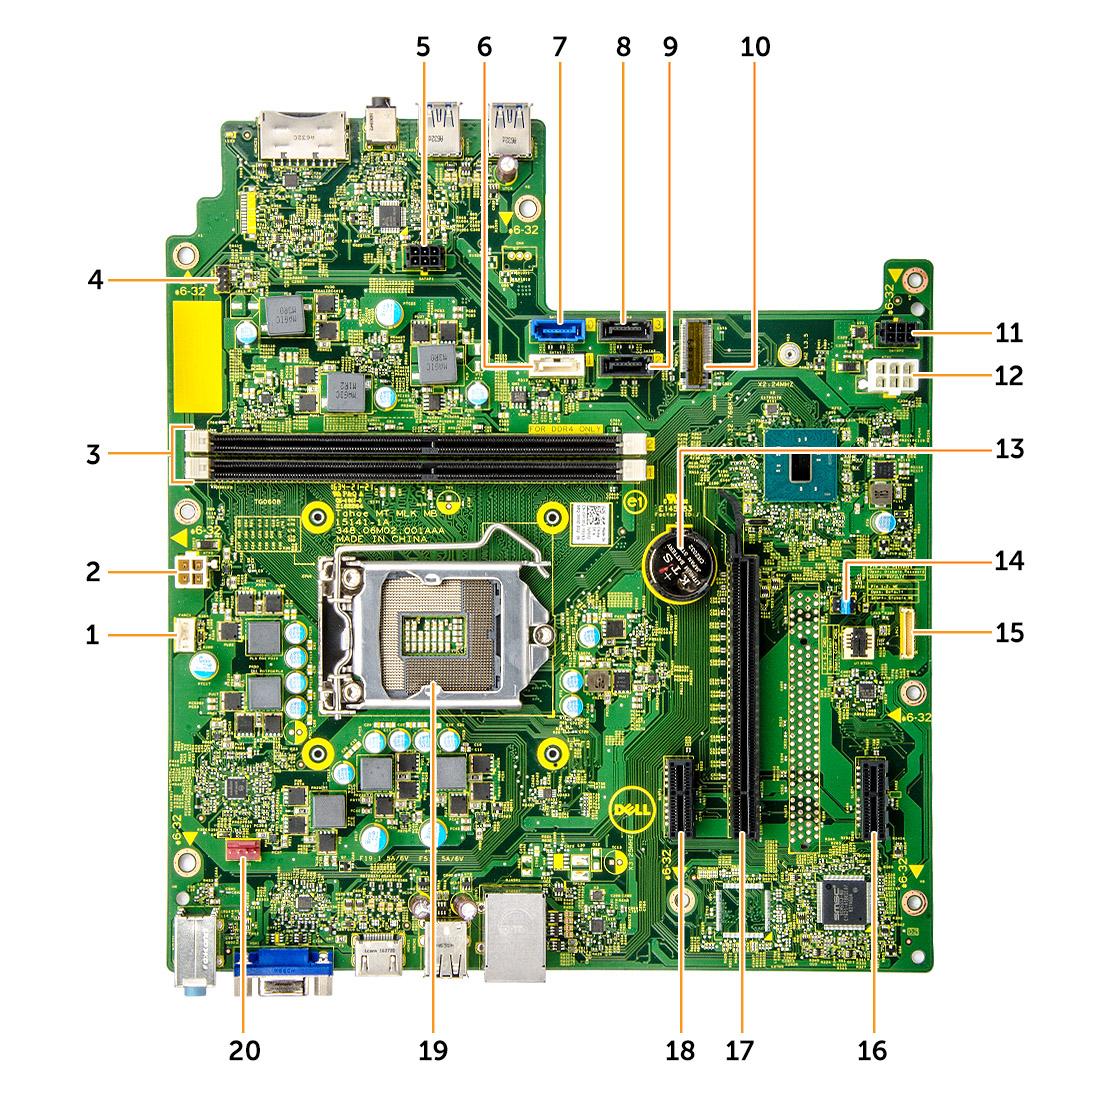 Computer Motherboard Wiring Diagram Electrical Diagrams Wii U Vstro Auto Microphone